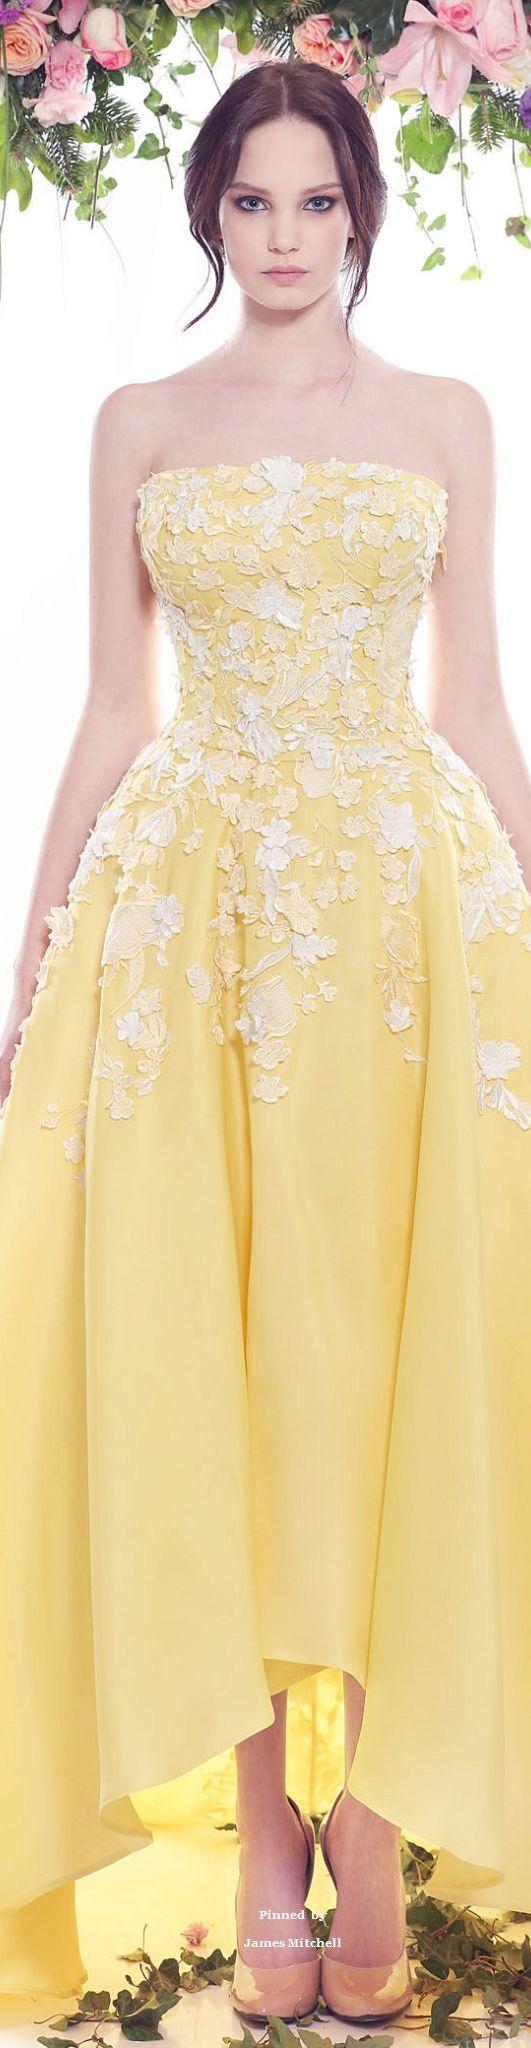 Fadwa Baalbaki Couture Spring-summer 2016 - jαɢlαdy